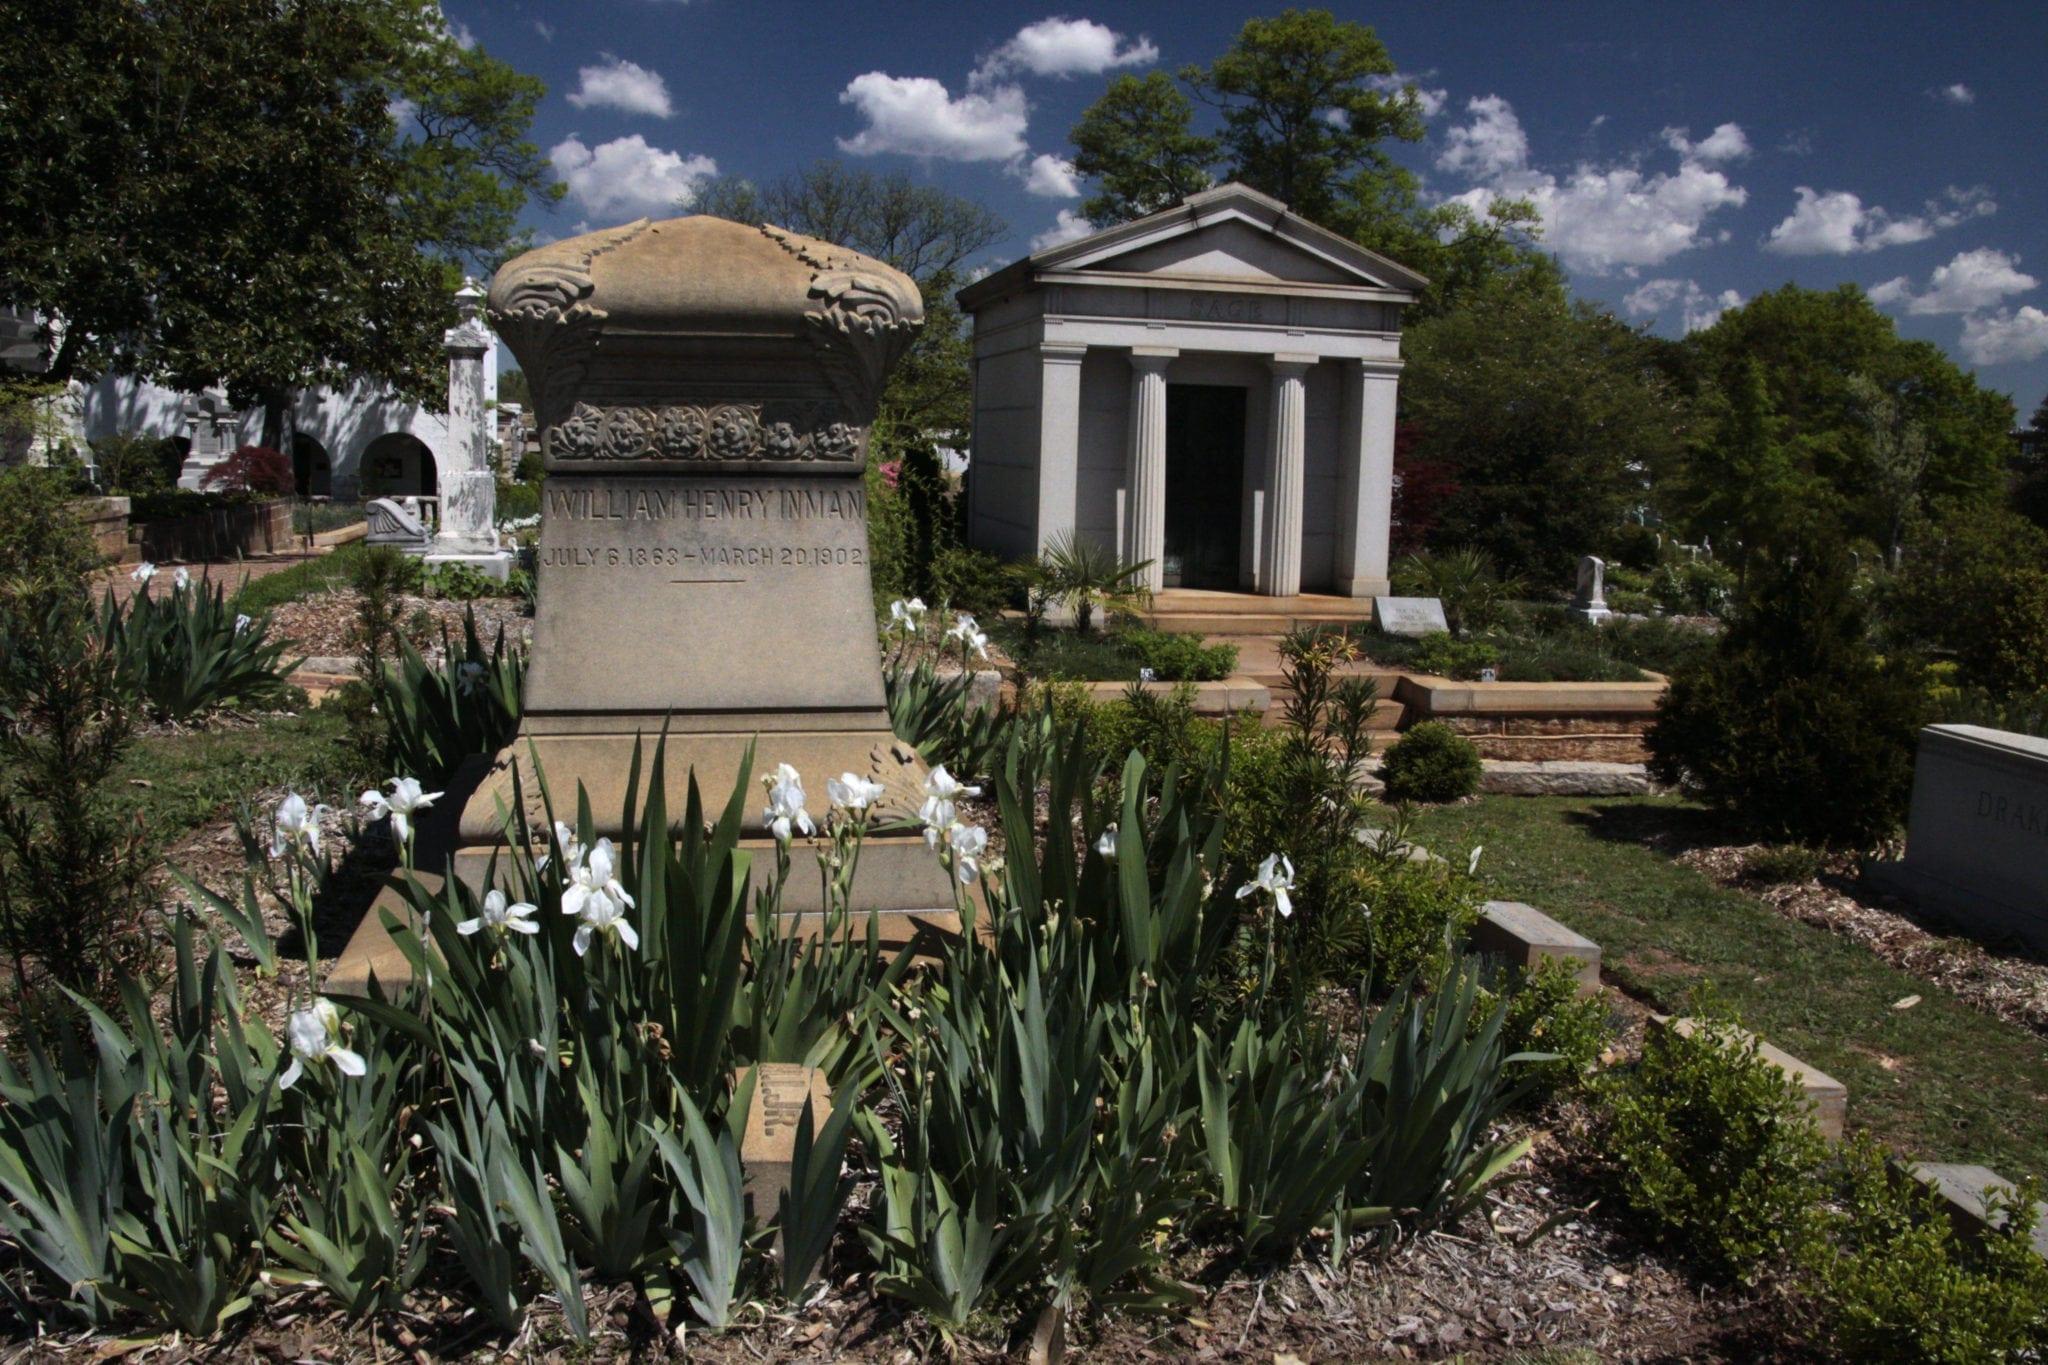 Oakland Cemetery gardens. Photo by Dinny Addison, courtesy the Historic Oakland Foundation.